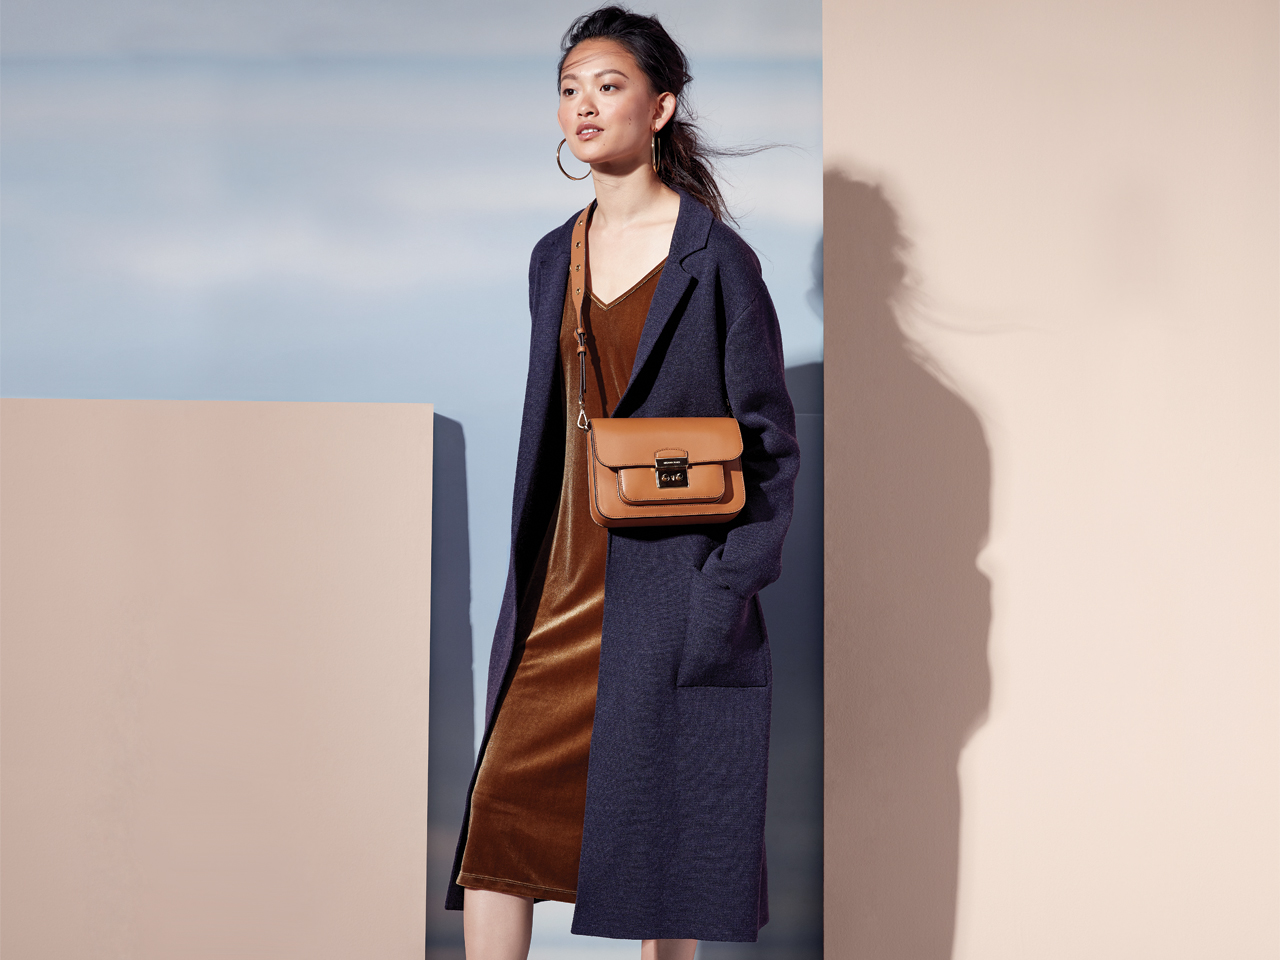 A model wears a velvet dress under an oversized cardigan.